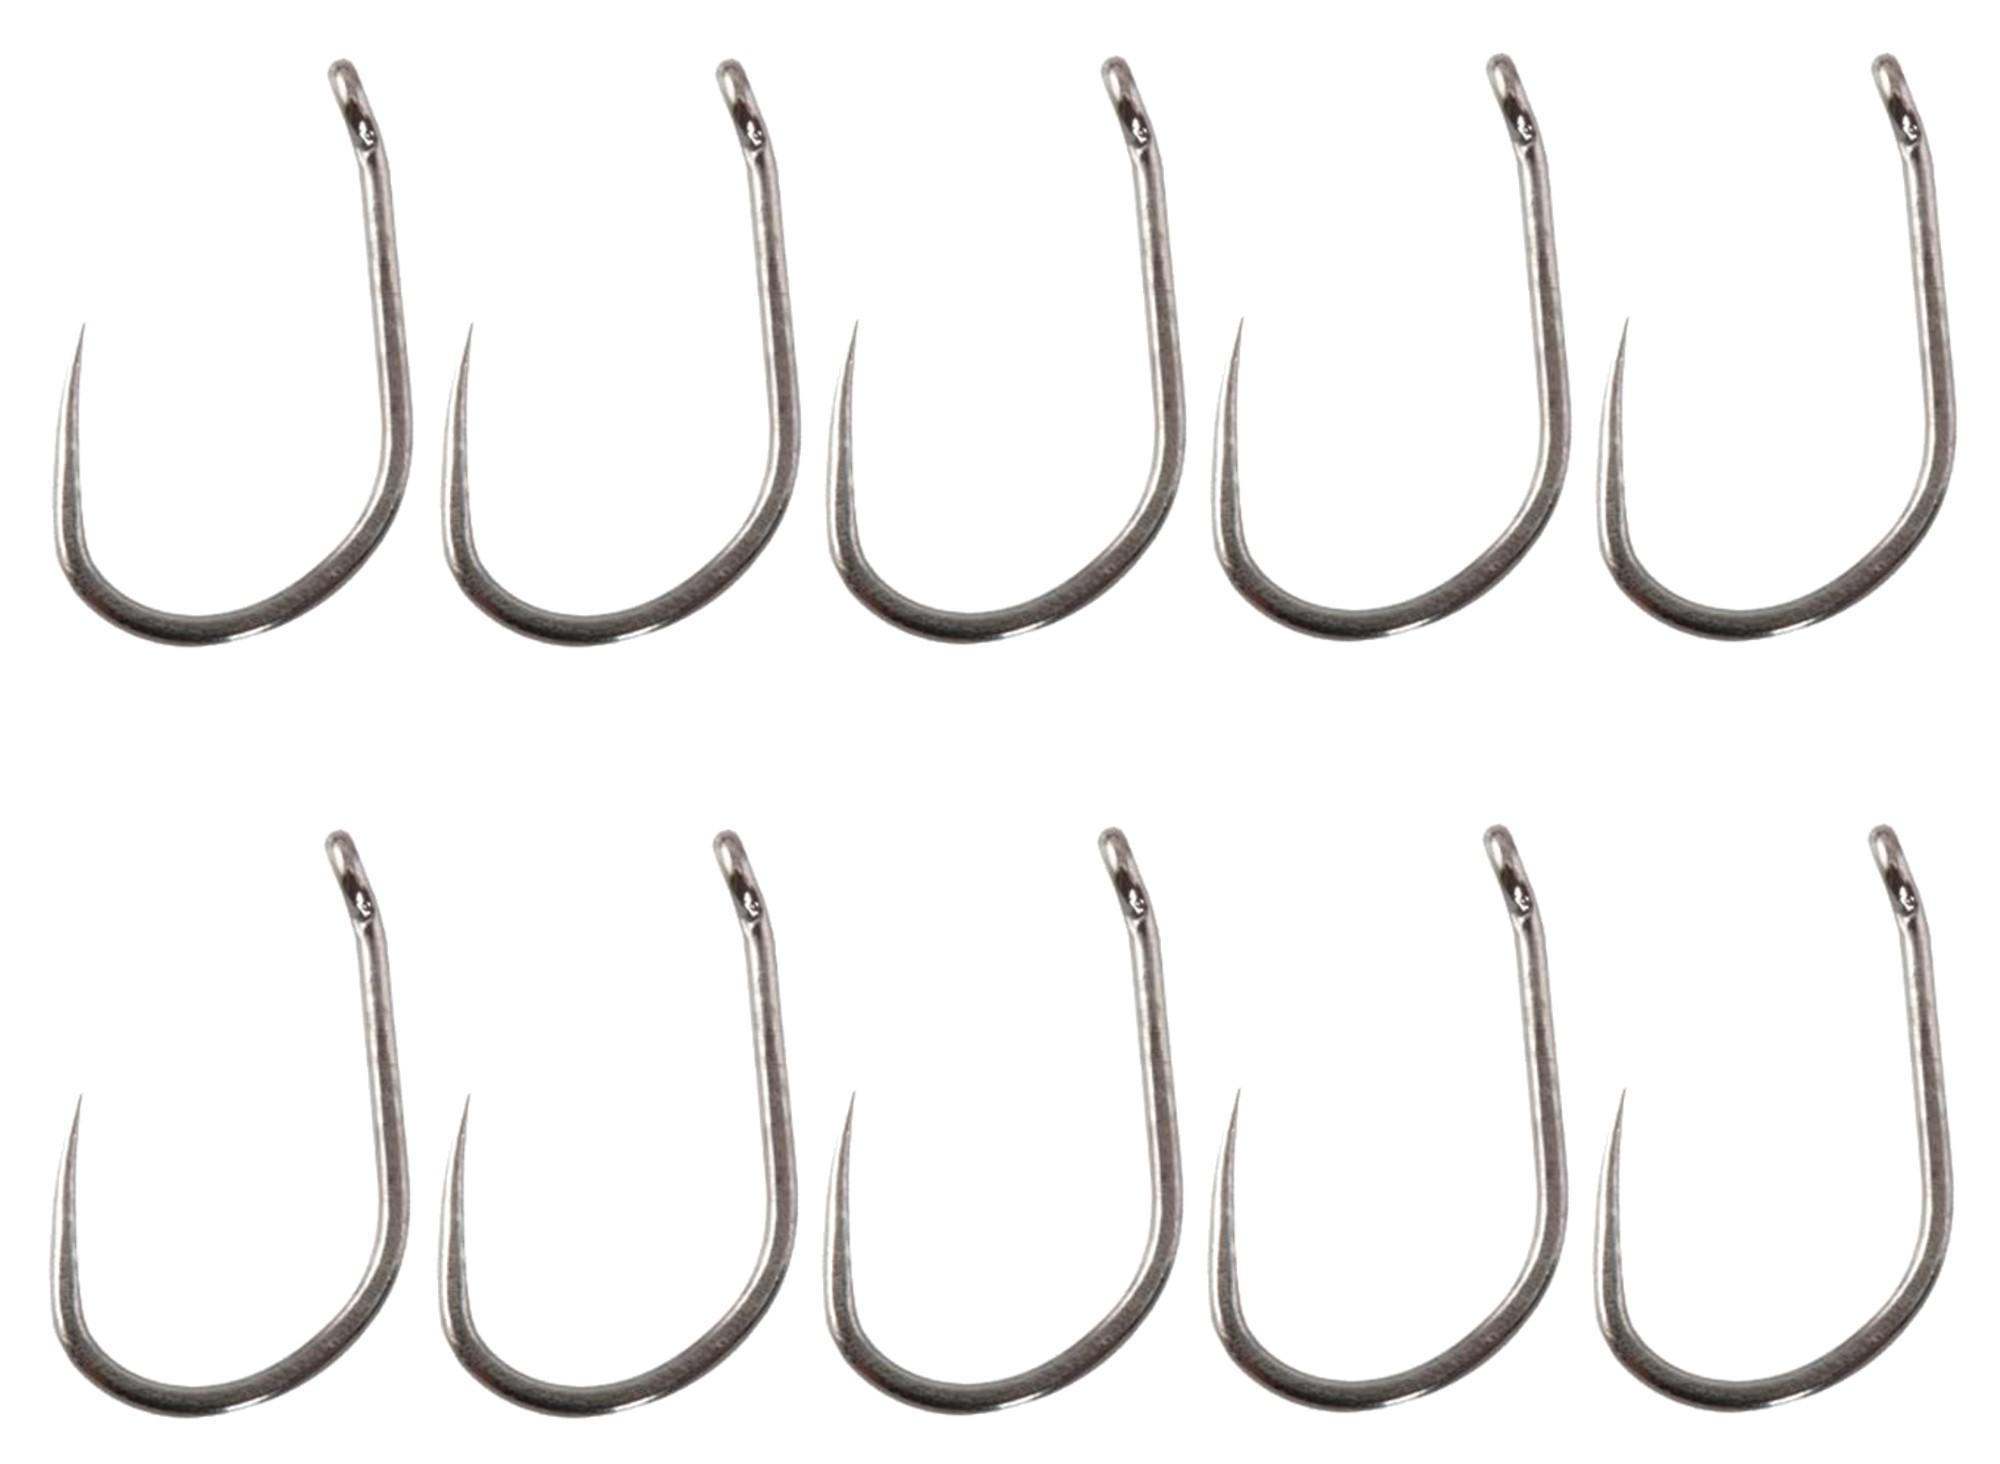 Angelhaken zum Stippen 10 Stipphaken Fox Matrix Bander Hooks Friedfischhaken